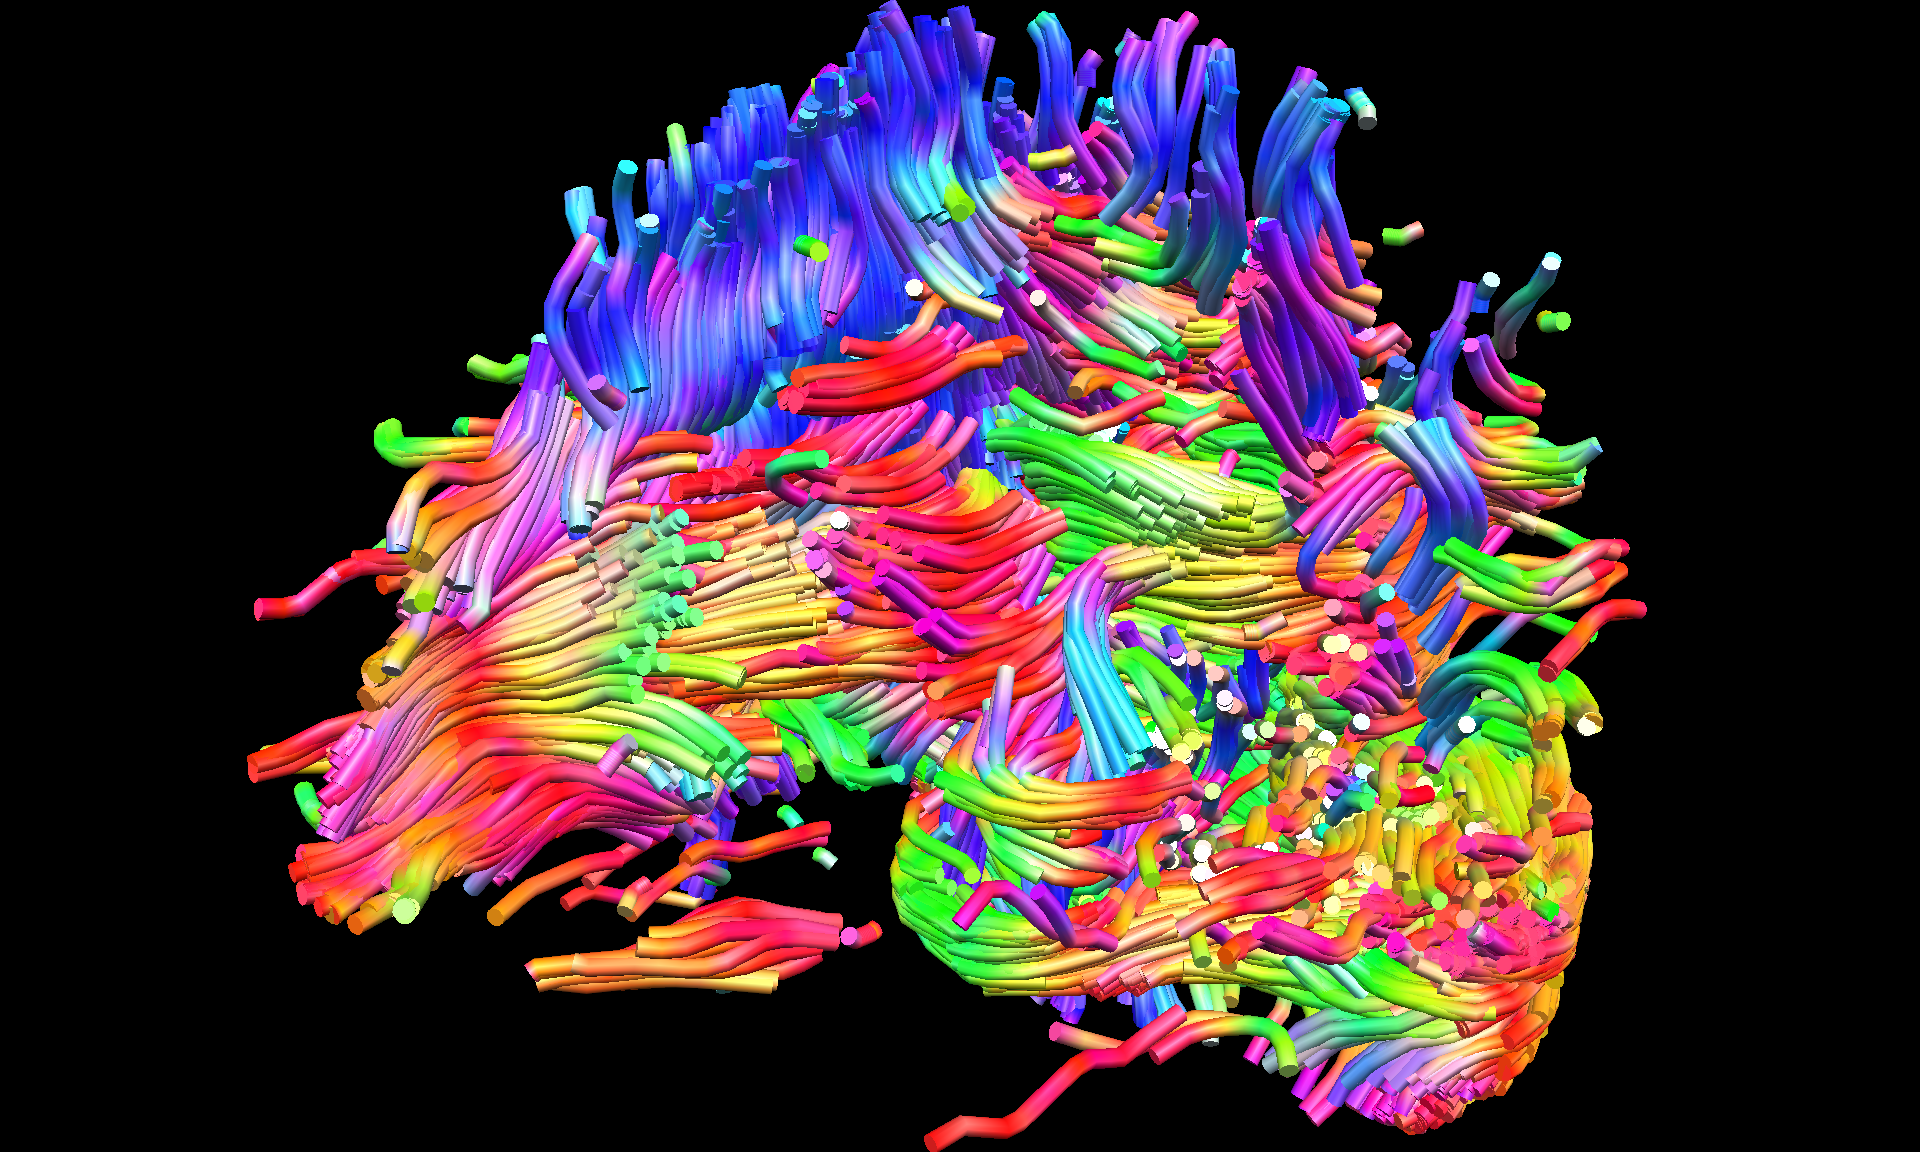 Lorin Strohm  (Fluid boundaries of perception - Lecture by Dr. Saskia Steinmann, Harvard Medical School 0)